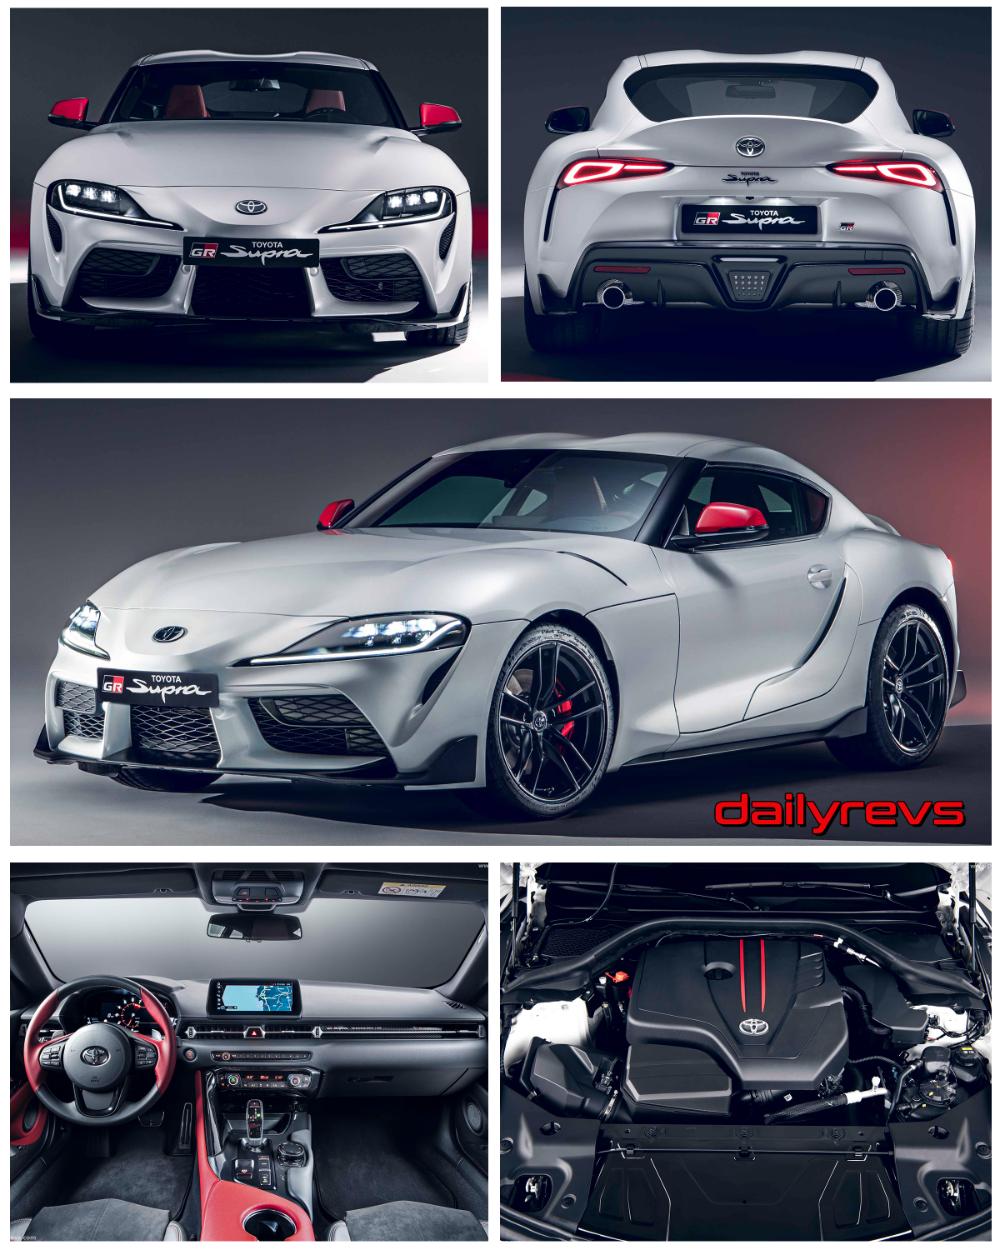 2020 Toyota Supra 2.0L Turbo HD Pictures, Videos, Specs